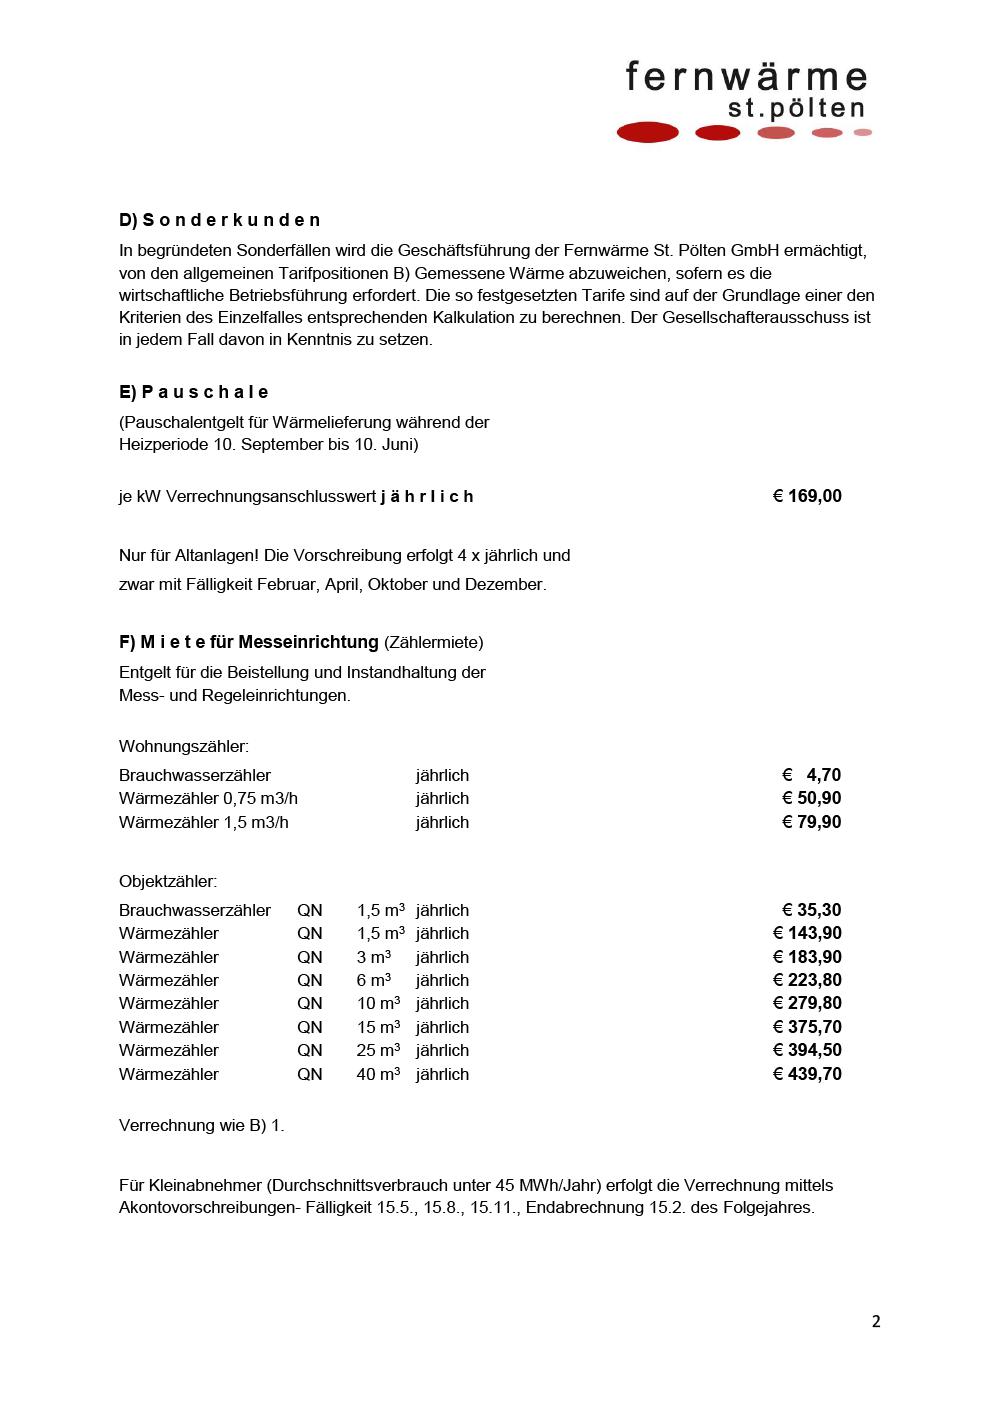 Tarifblatt Seite 2